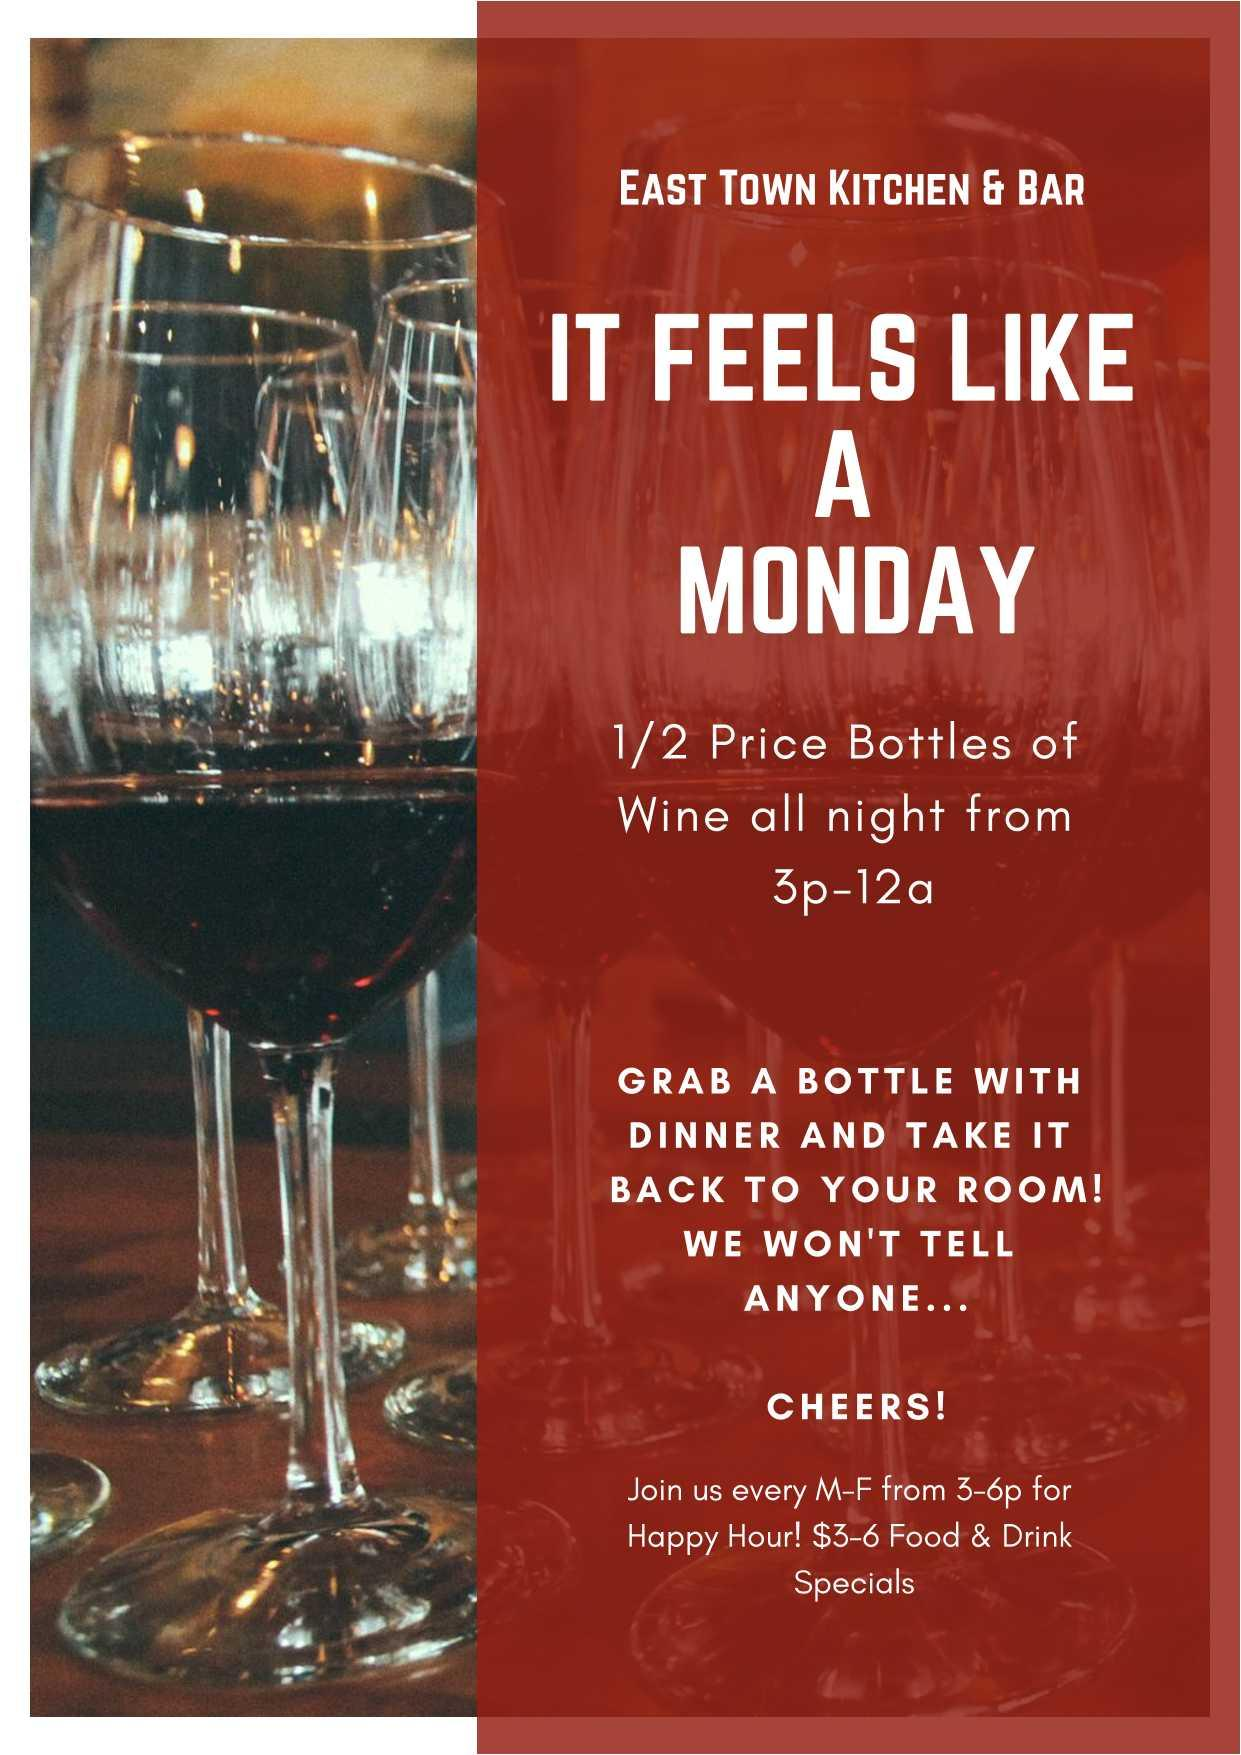 1/2 price bottles of wine at East Town Kitchen & Bar on Mondays